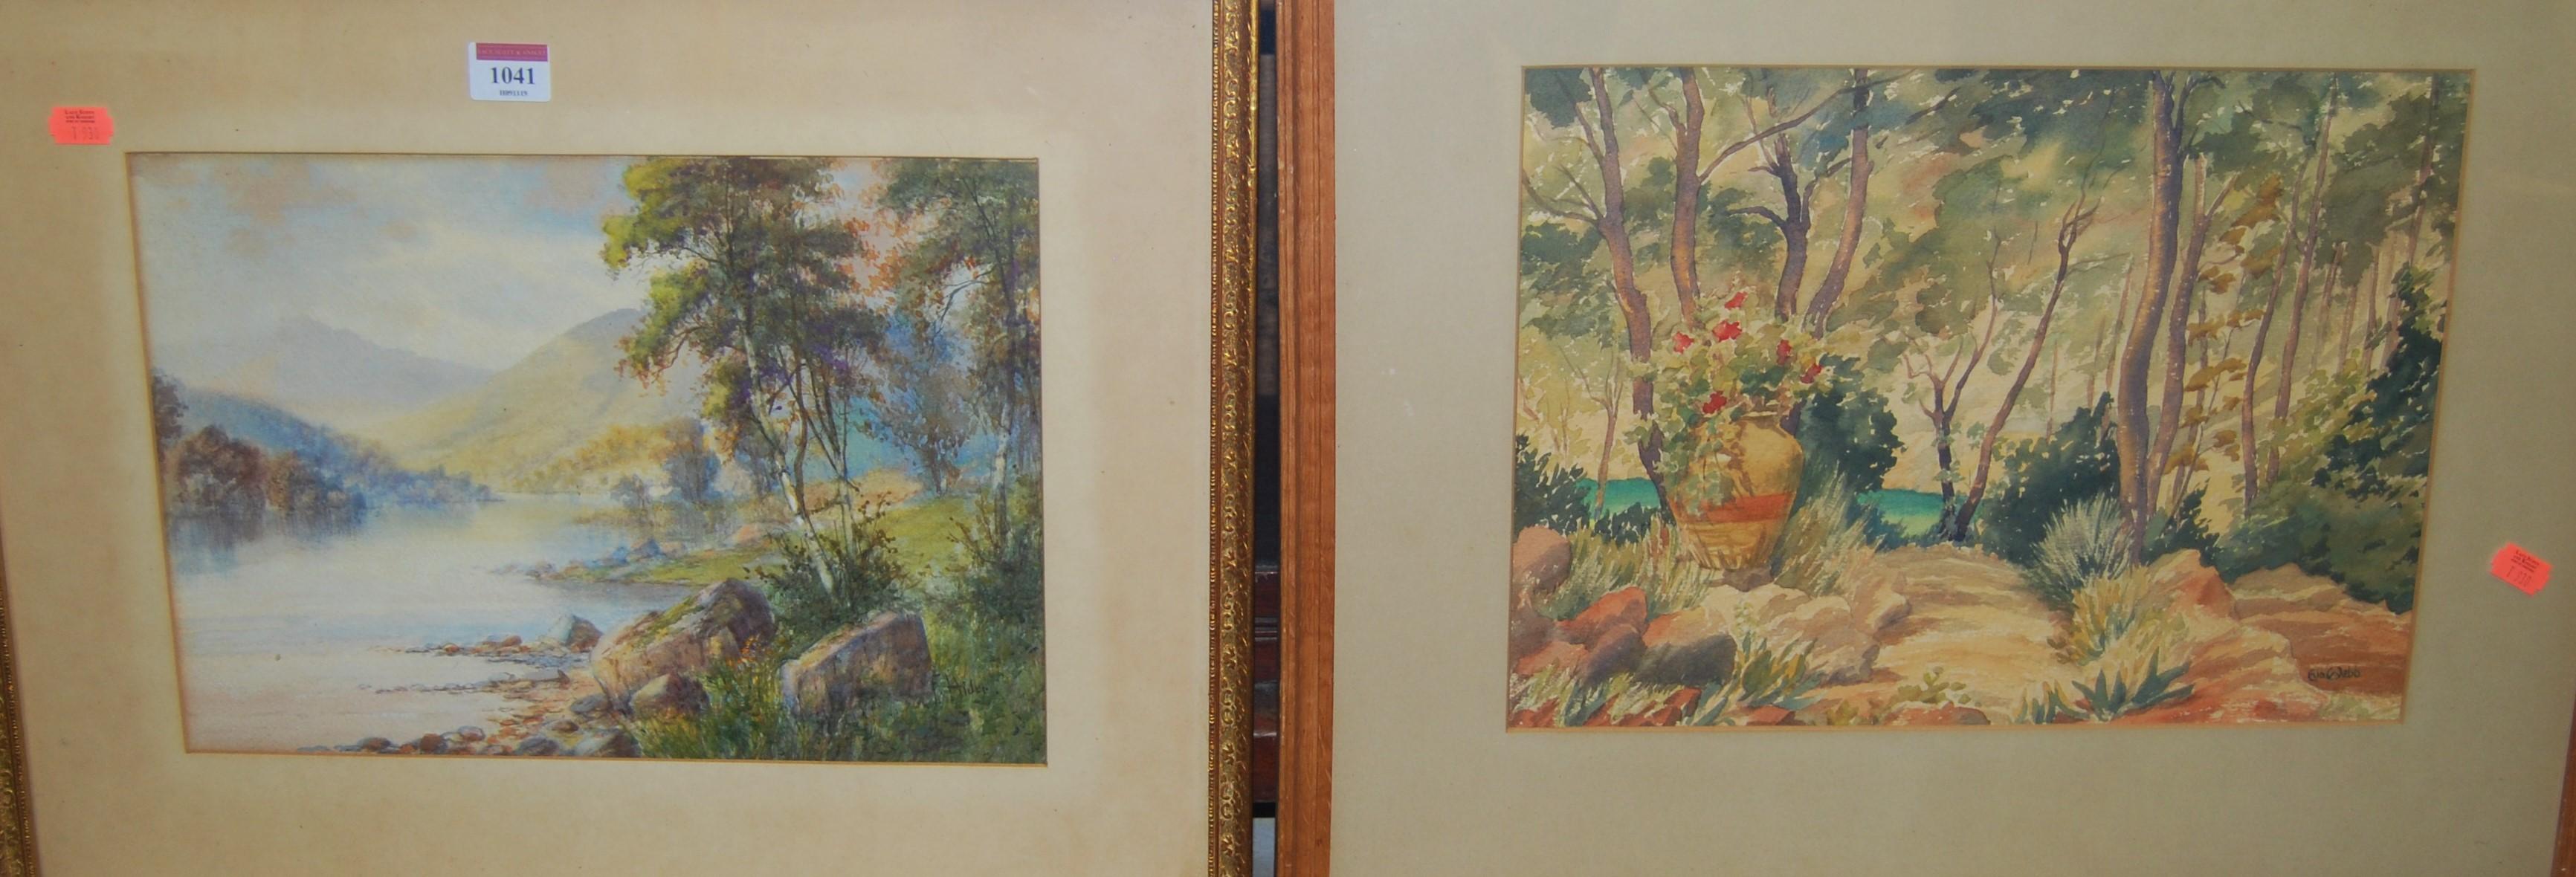 Lot 1041 - F. Hider - River landscape, watercolour, signed lower right, 25 x 35cm; and Eva Webb watercolour (